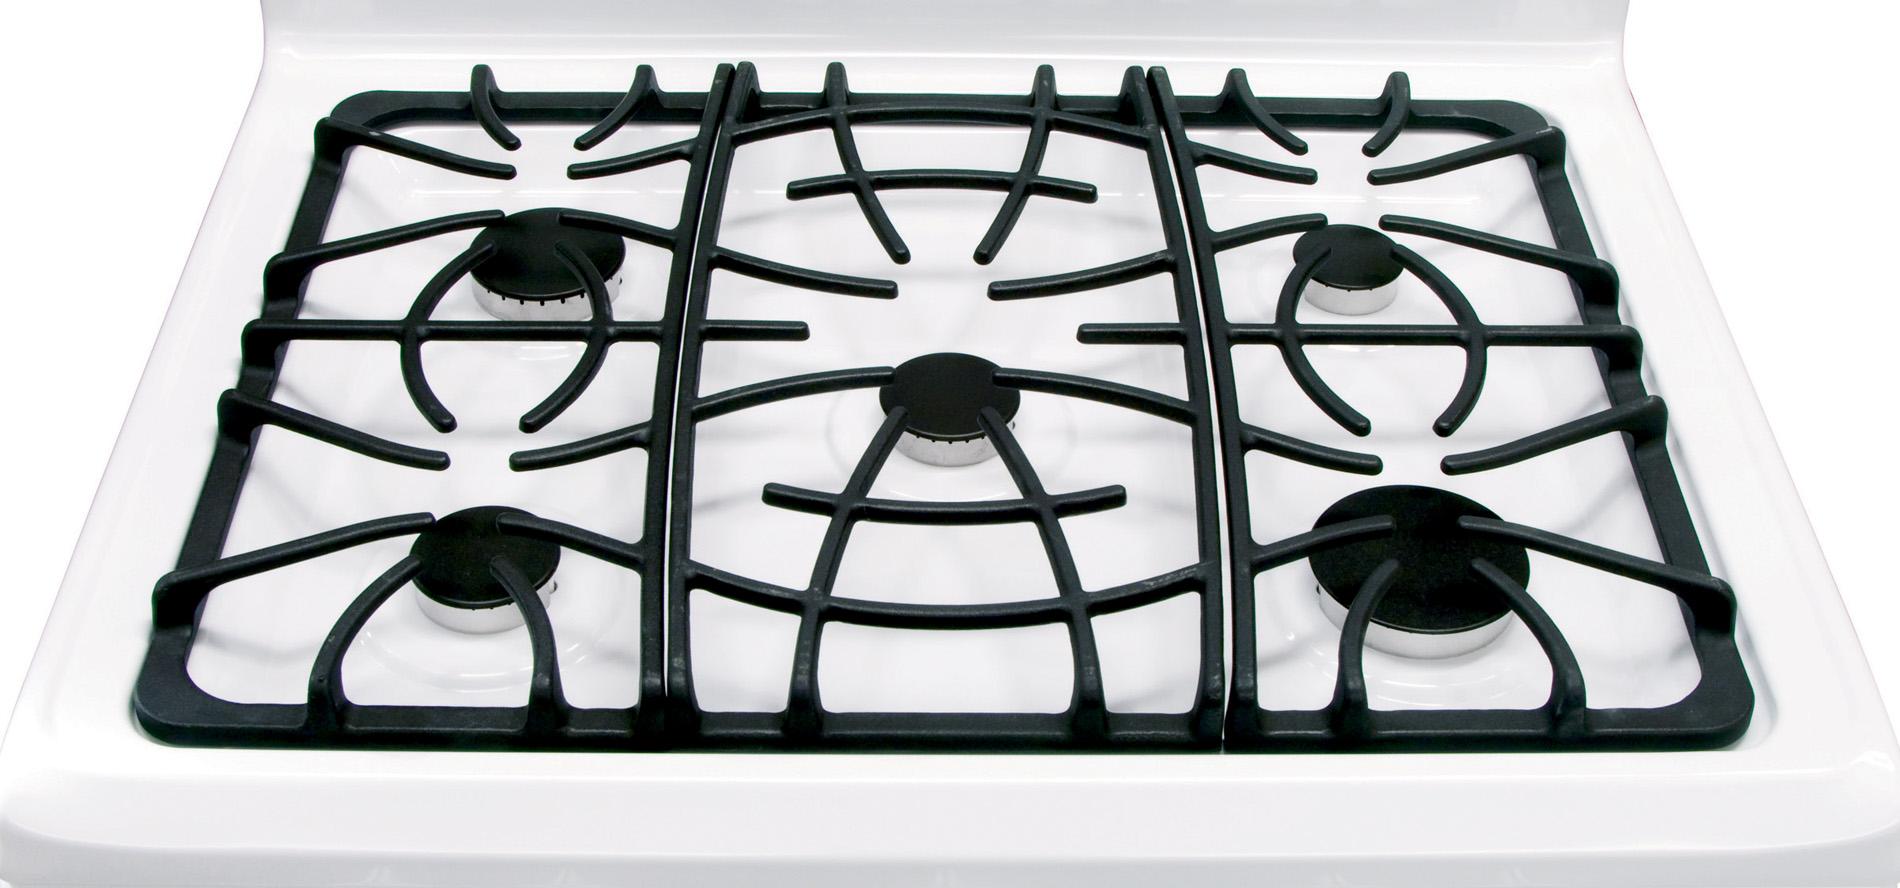 Frigidaire 5.0 cu. ft. Freestanding Gas Range  - White